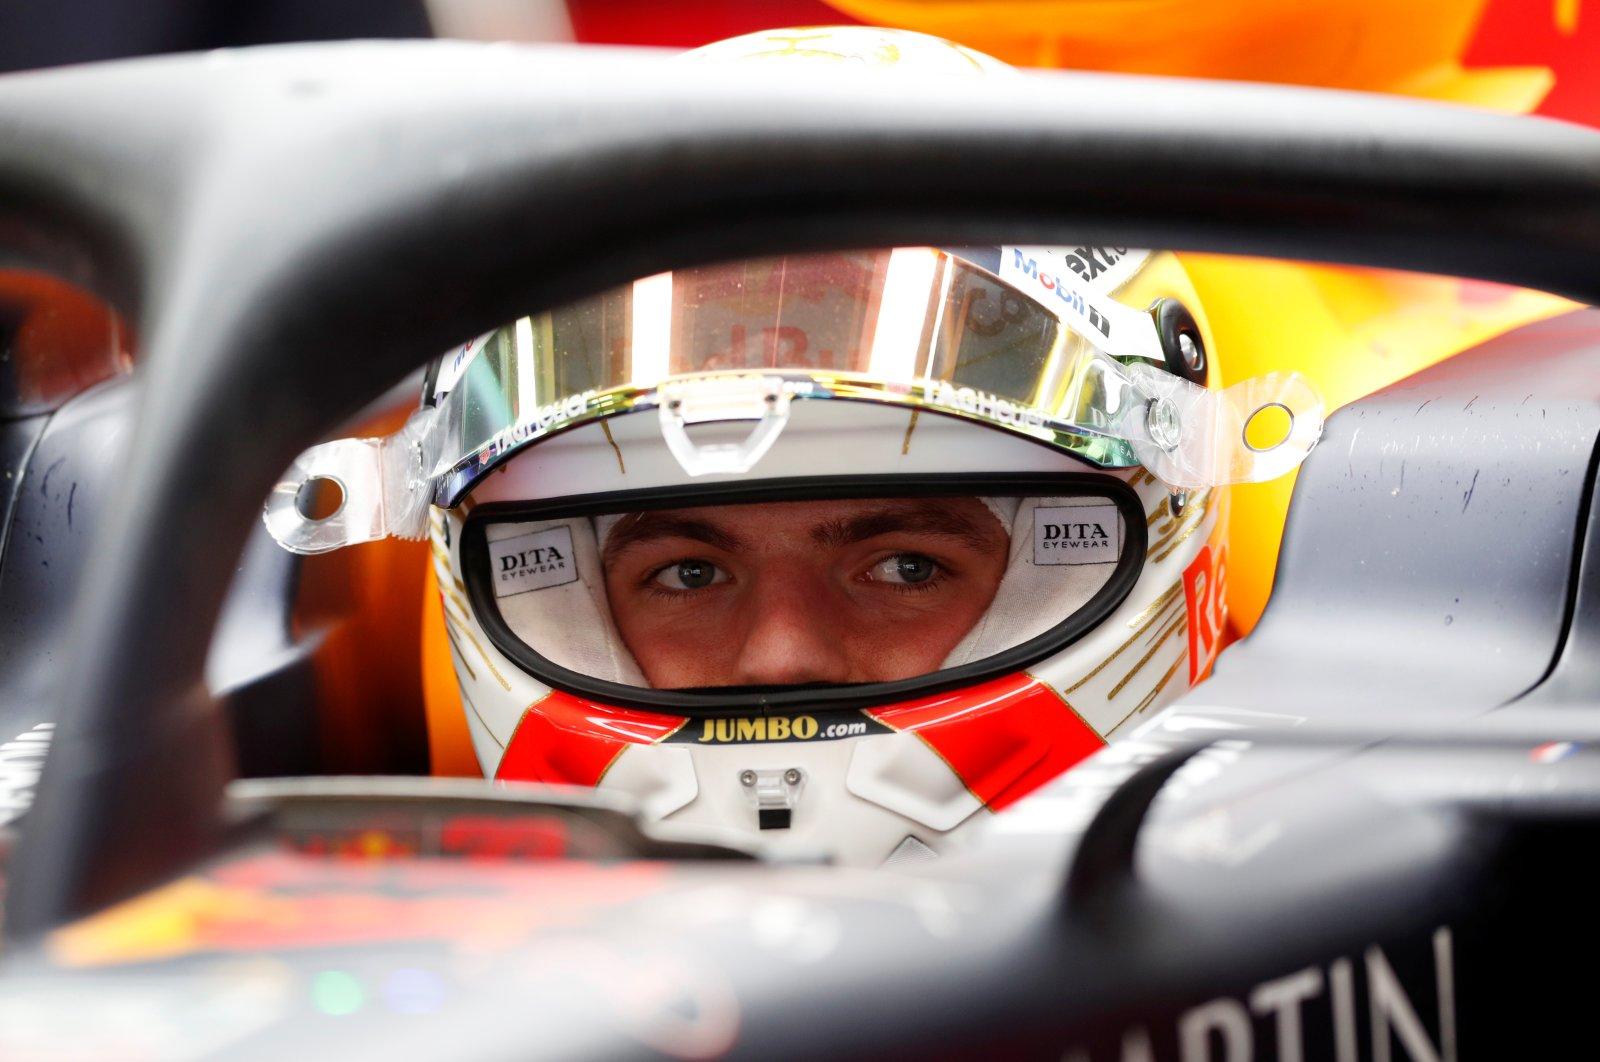 Red Bull's Max Verstappen in his car during pre-season testing in Barcelona, Feb. 28, 2020. (Reuters Photo)